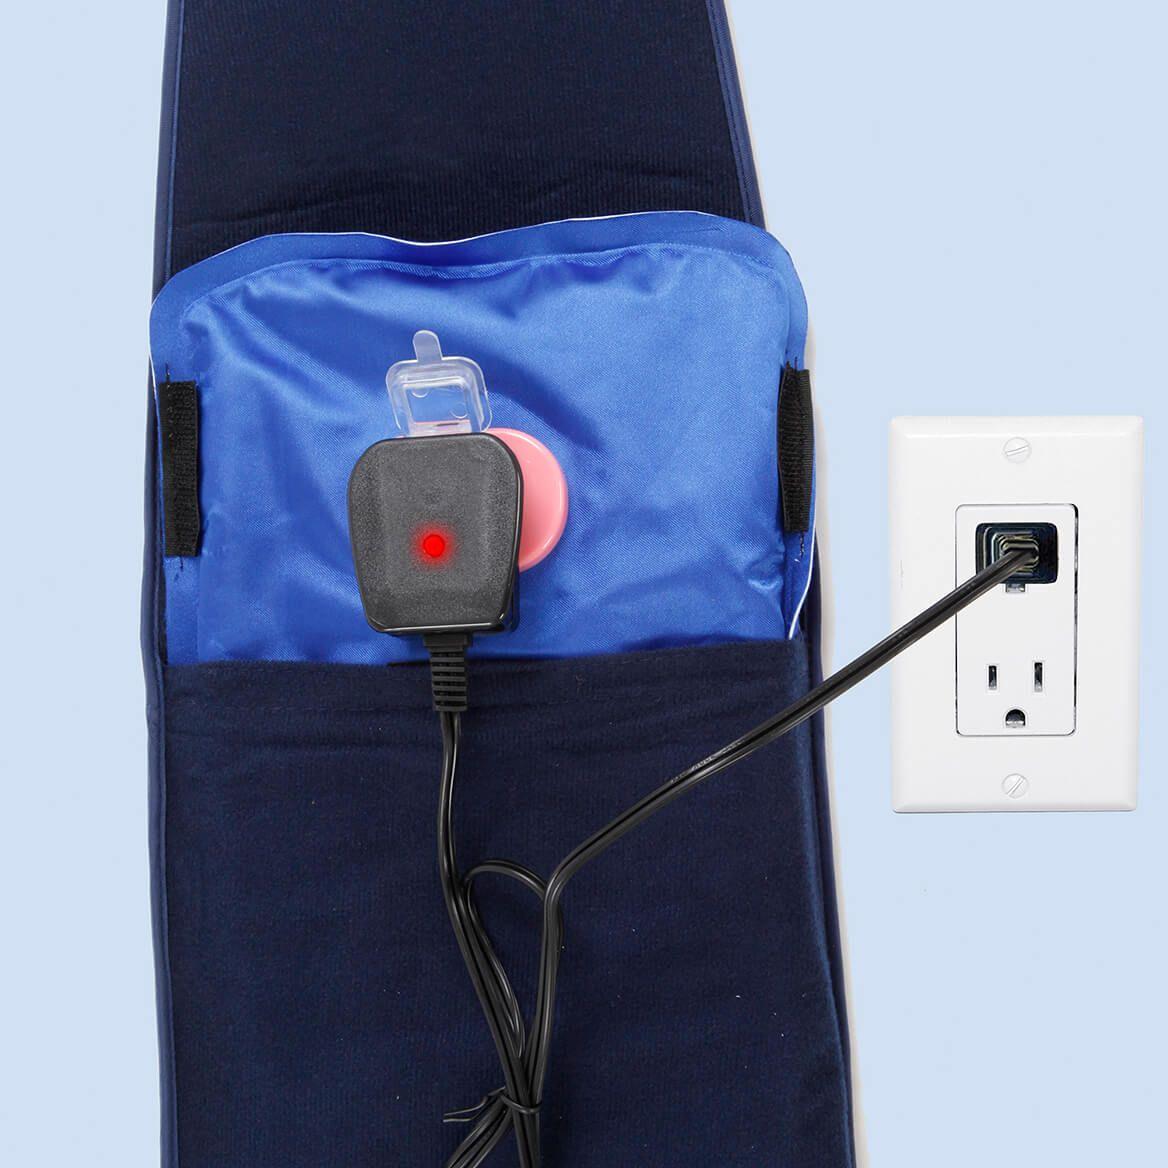 Rechargeable Hot Water Belt-369850